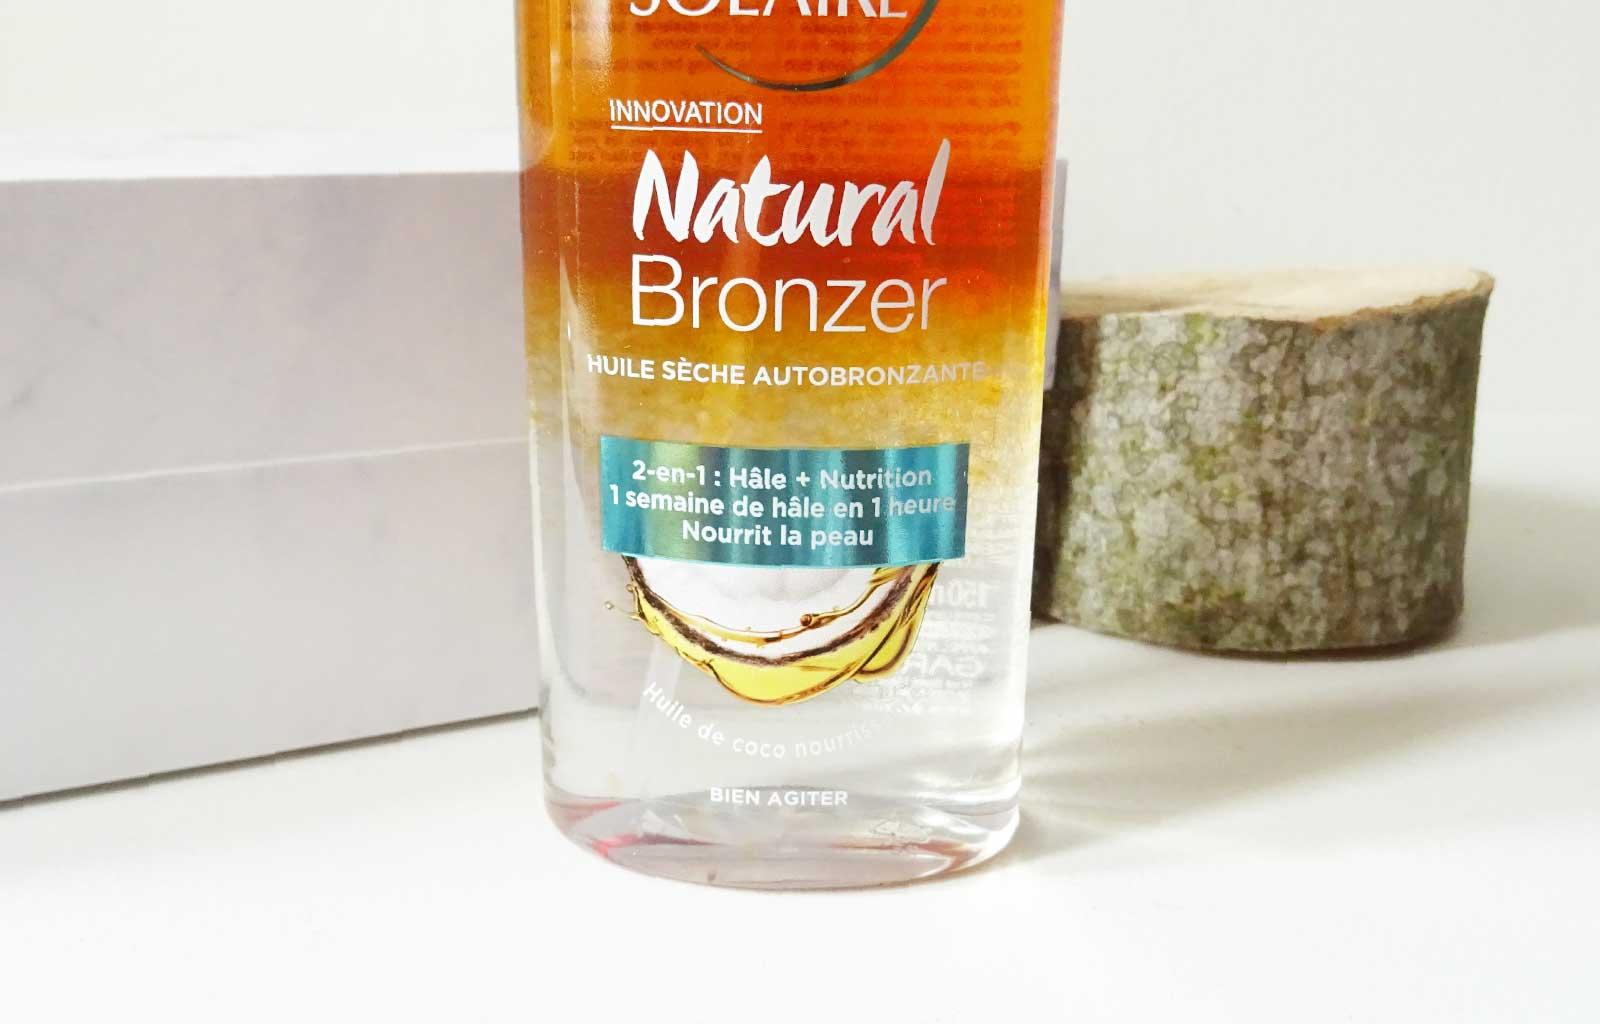 Huile sèche autobronzante Natural Bronzer Garnier